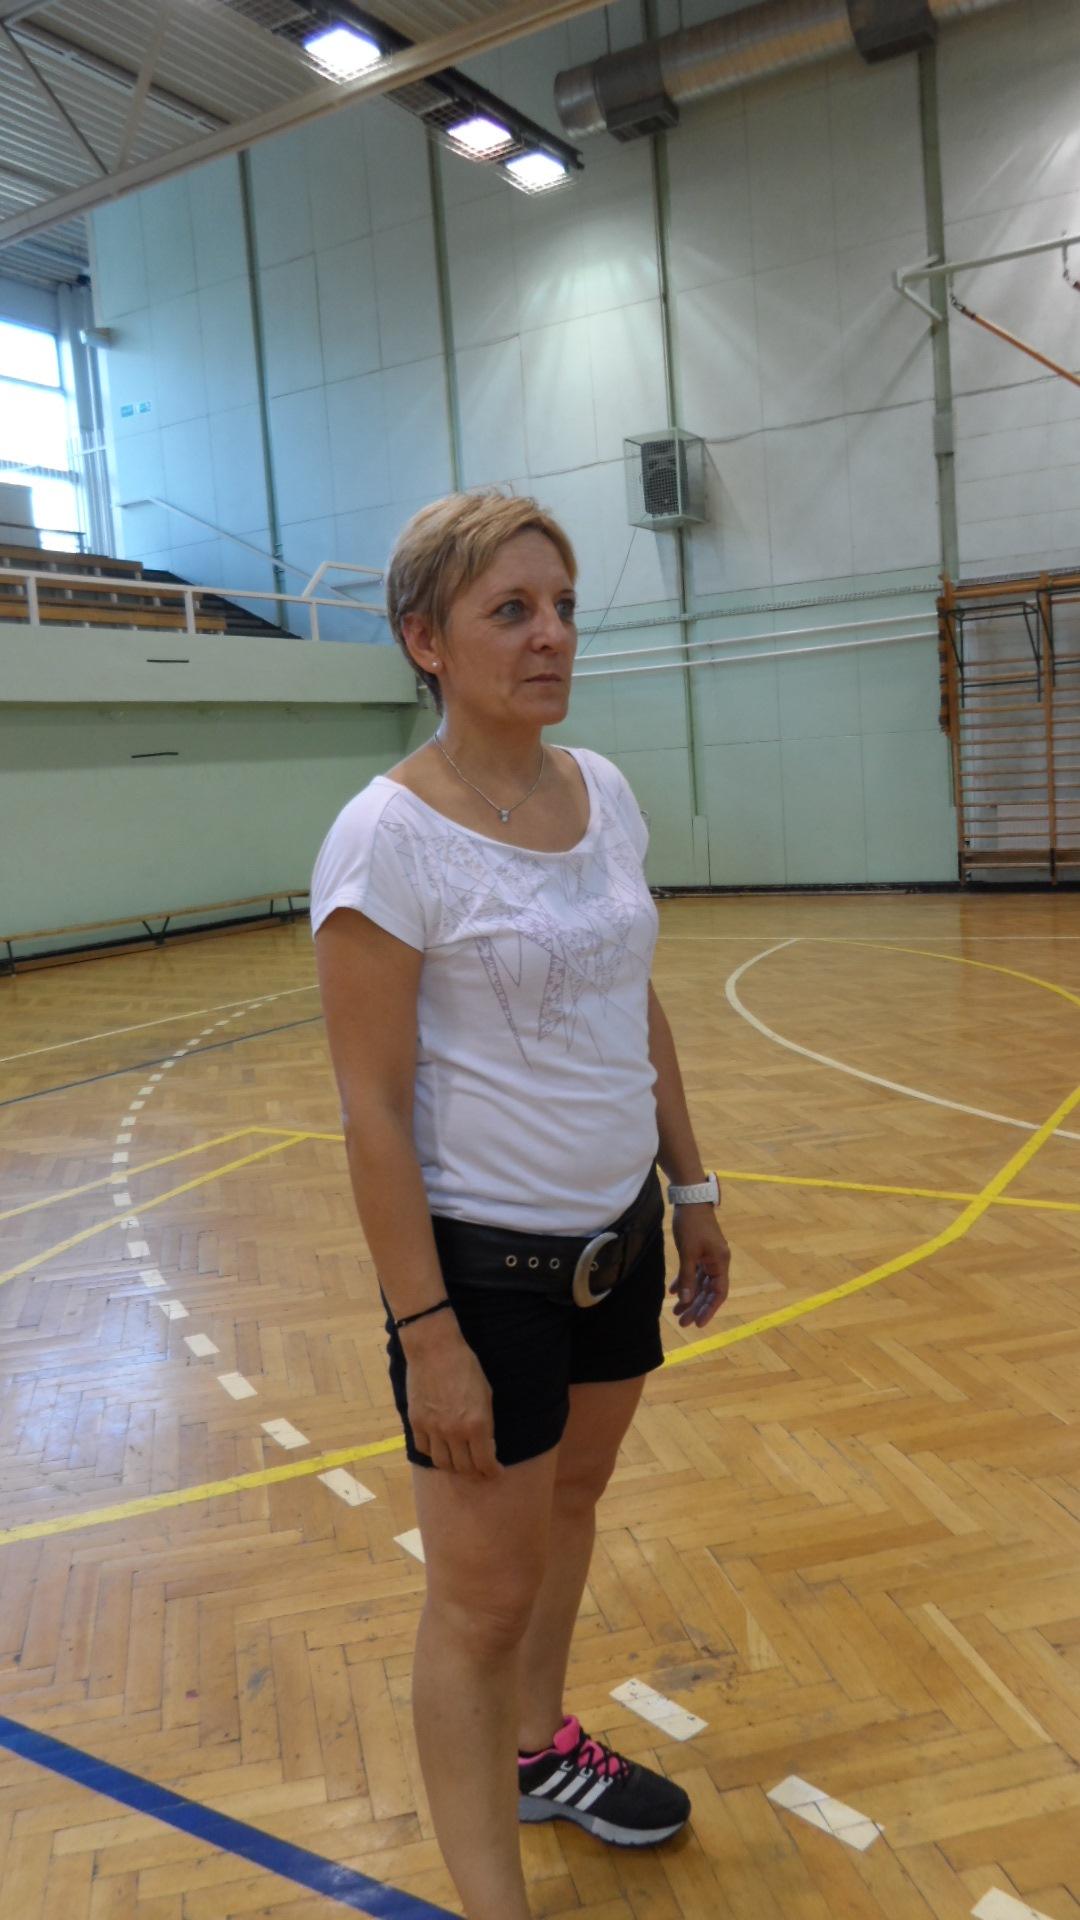 Szőke Tünde edző